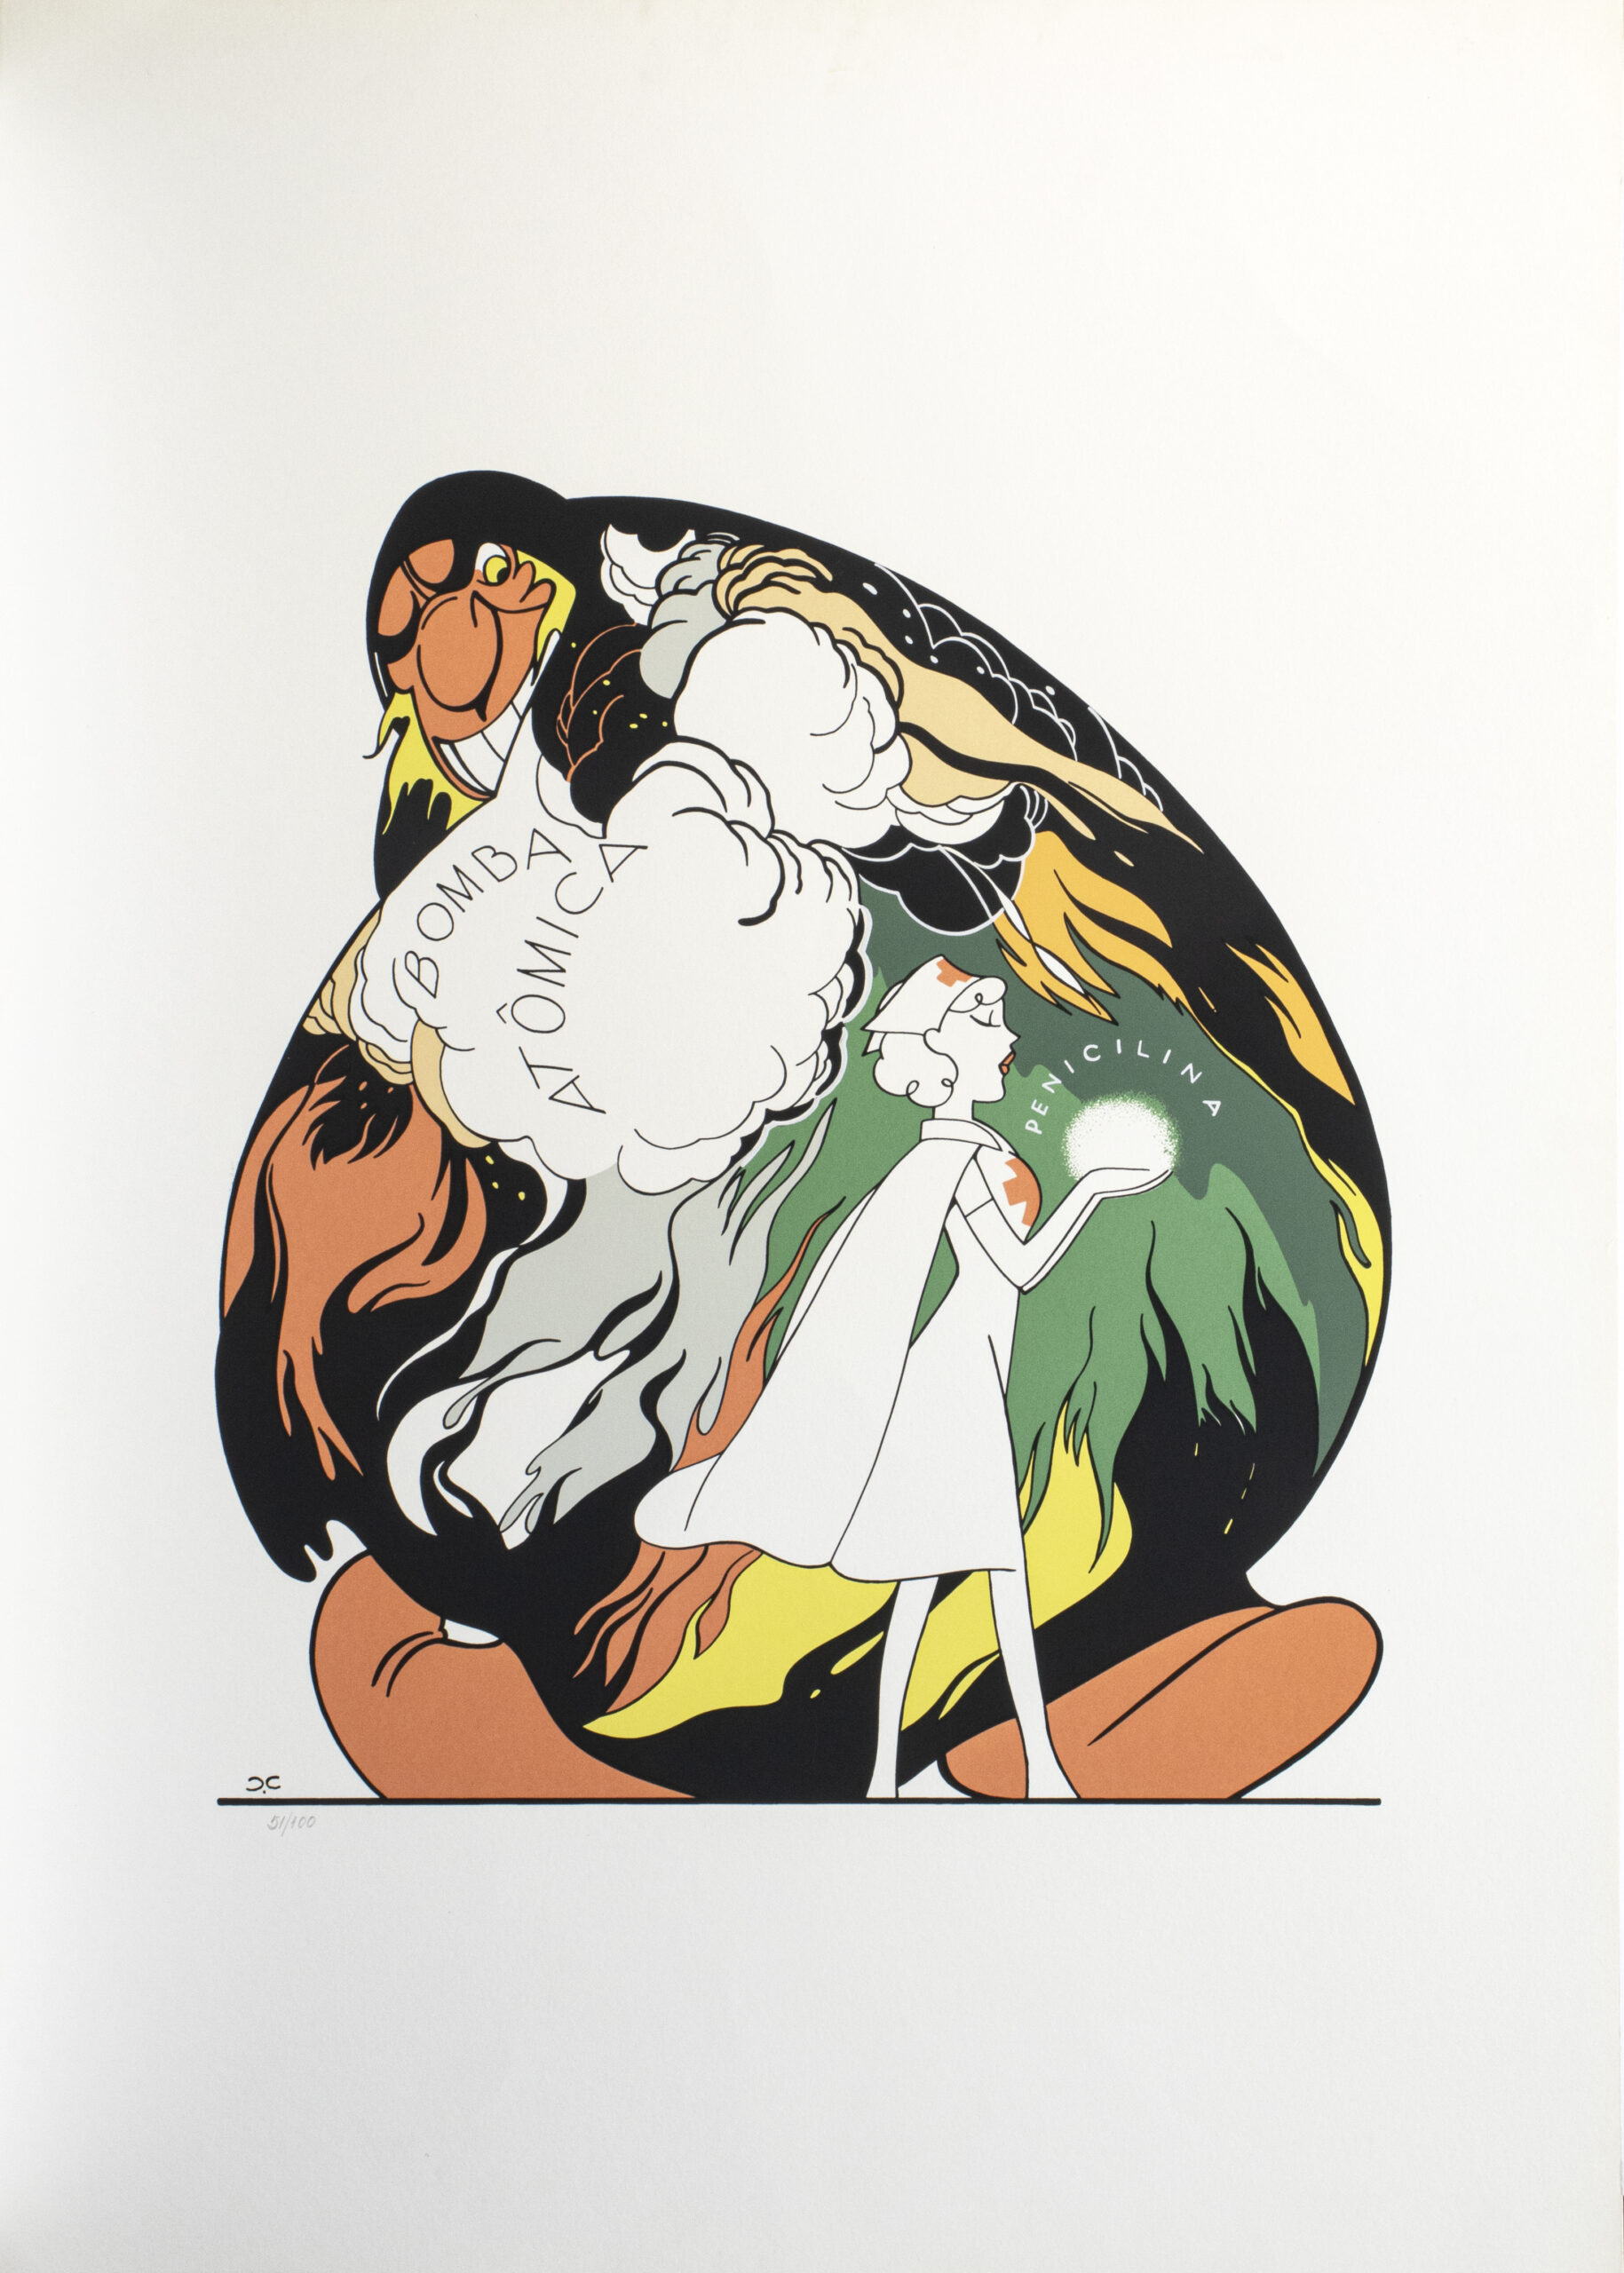 644 - J Carlos - 50x70cm - Serigrafia - ass. impressa